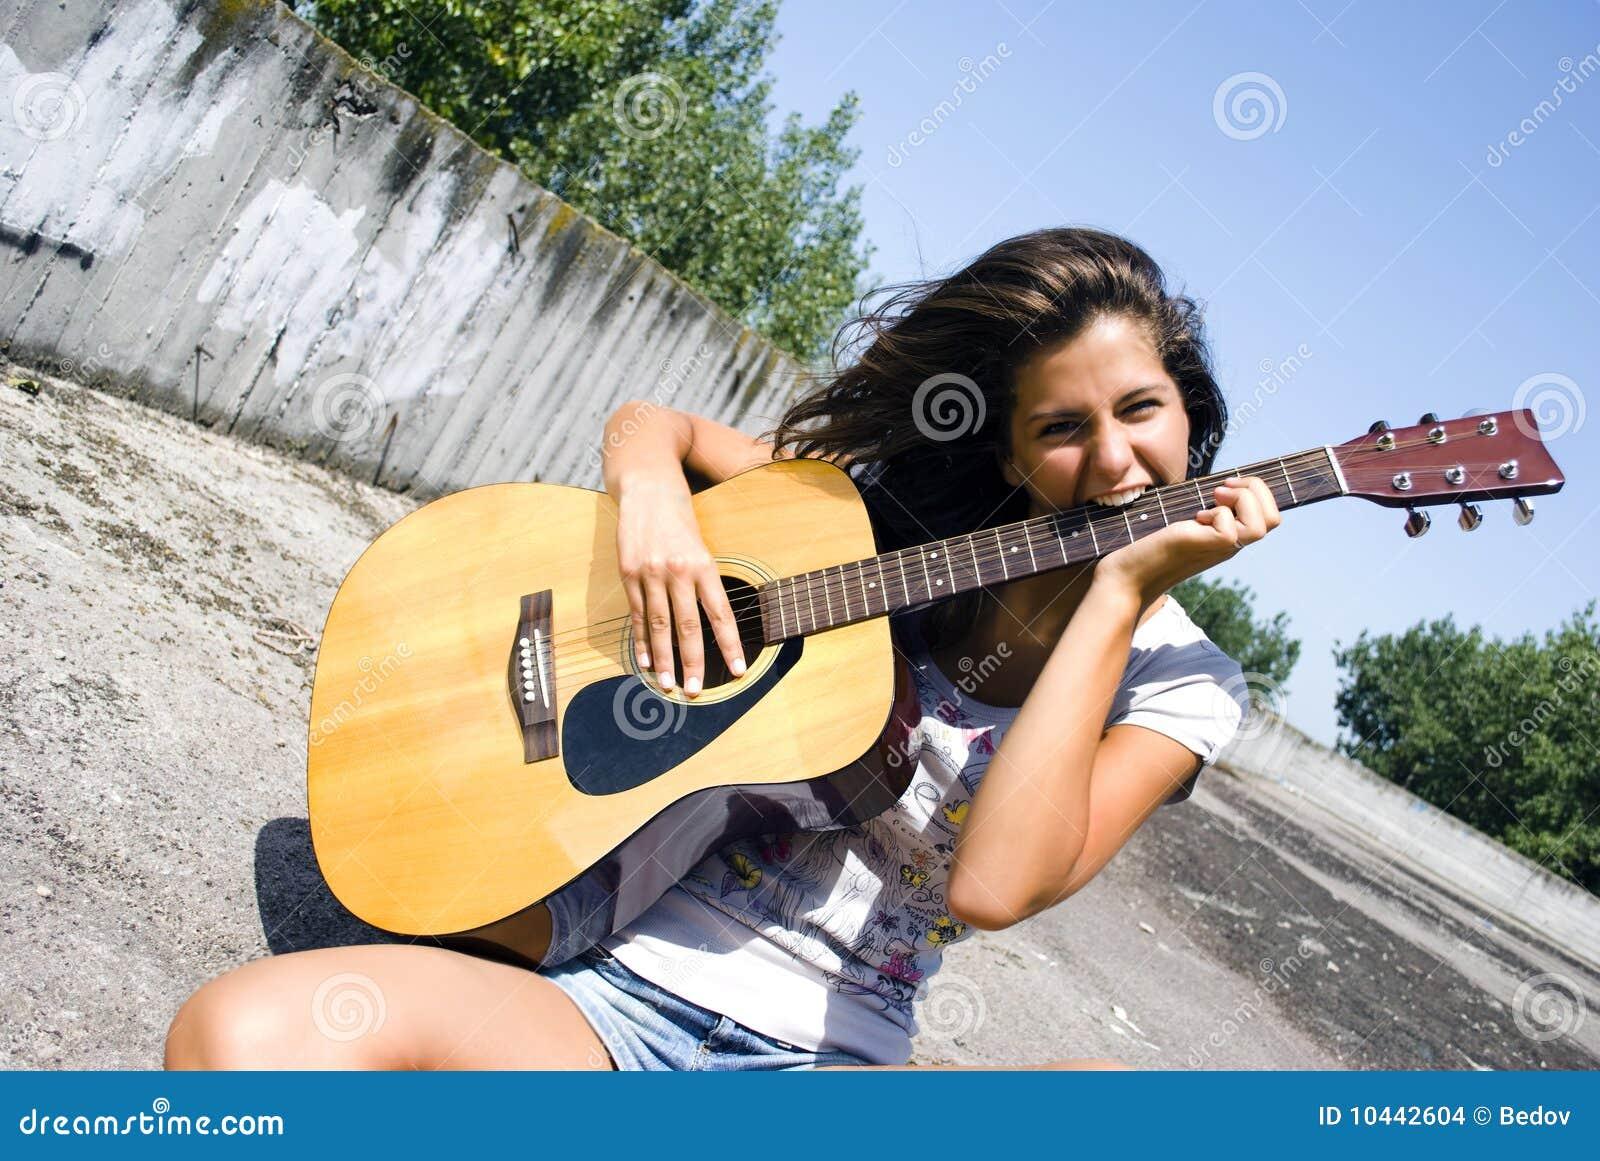 Girl bites guitar